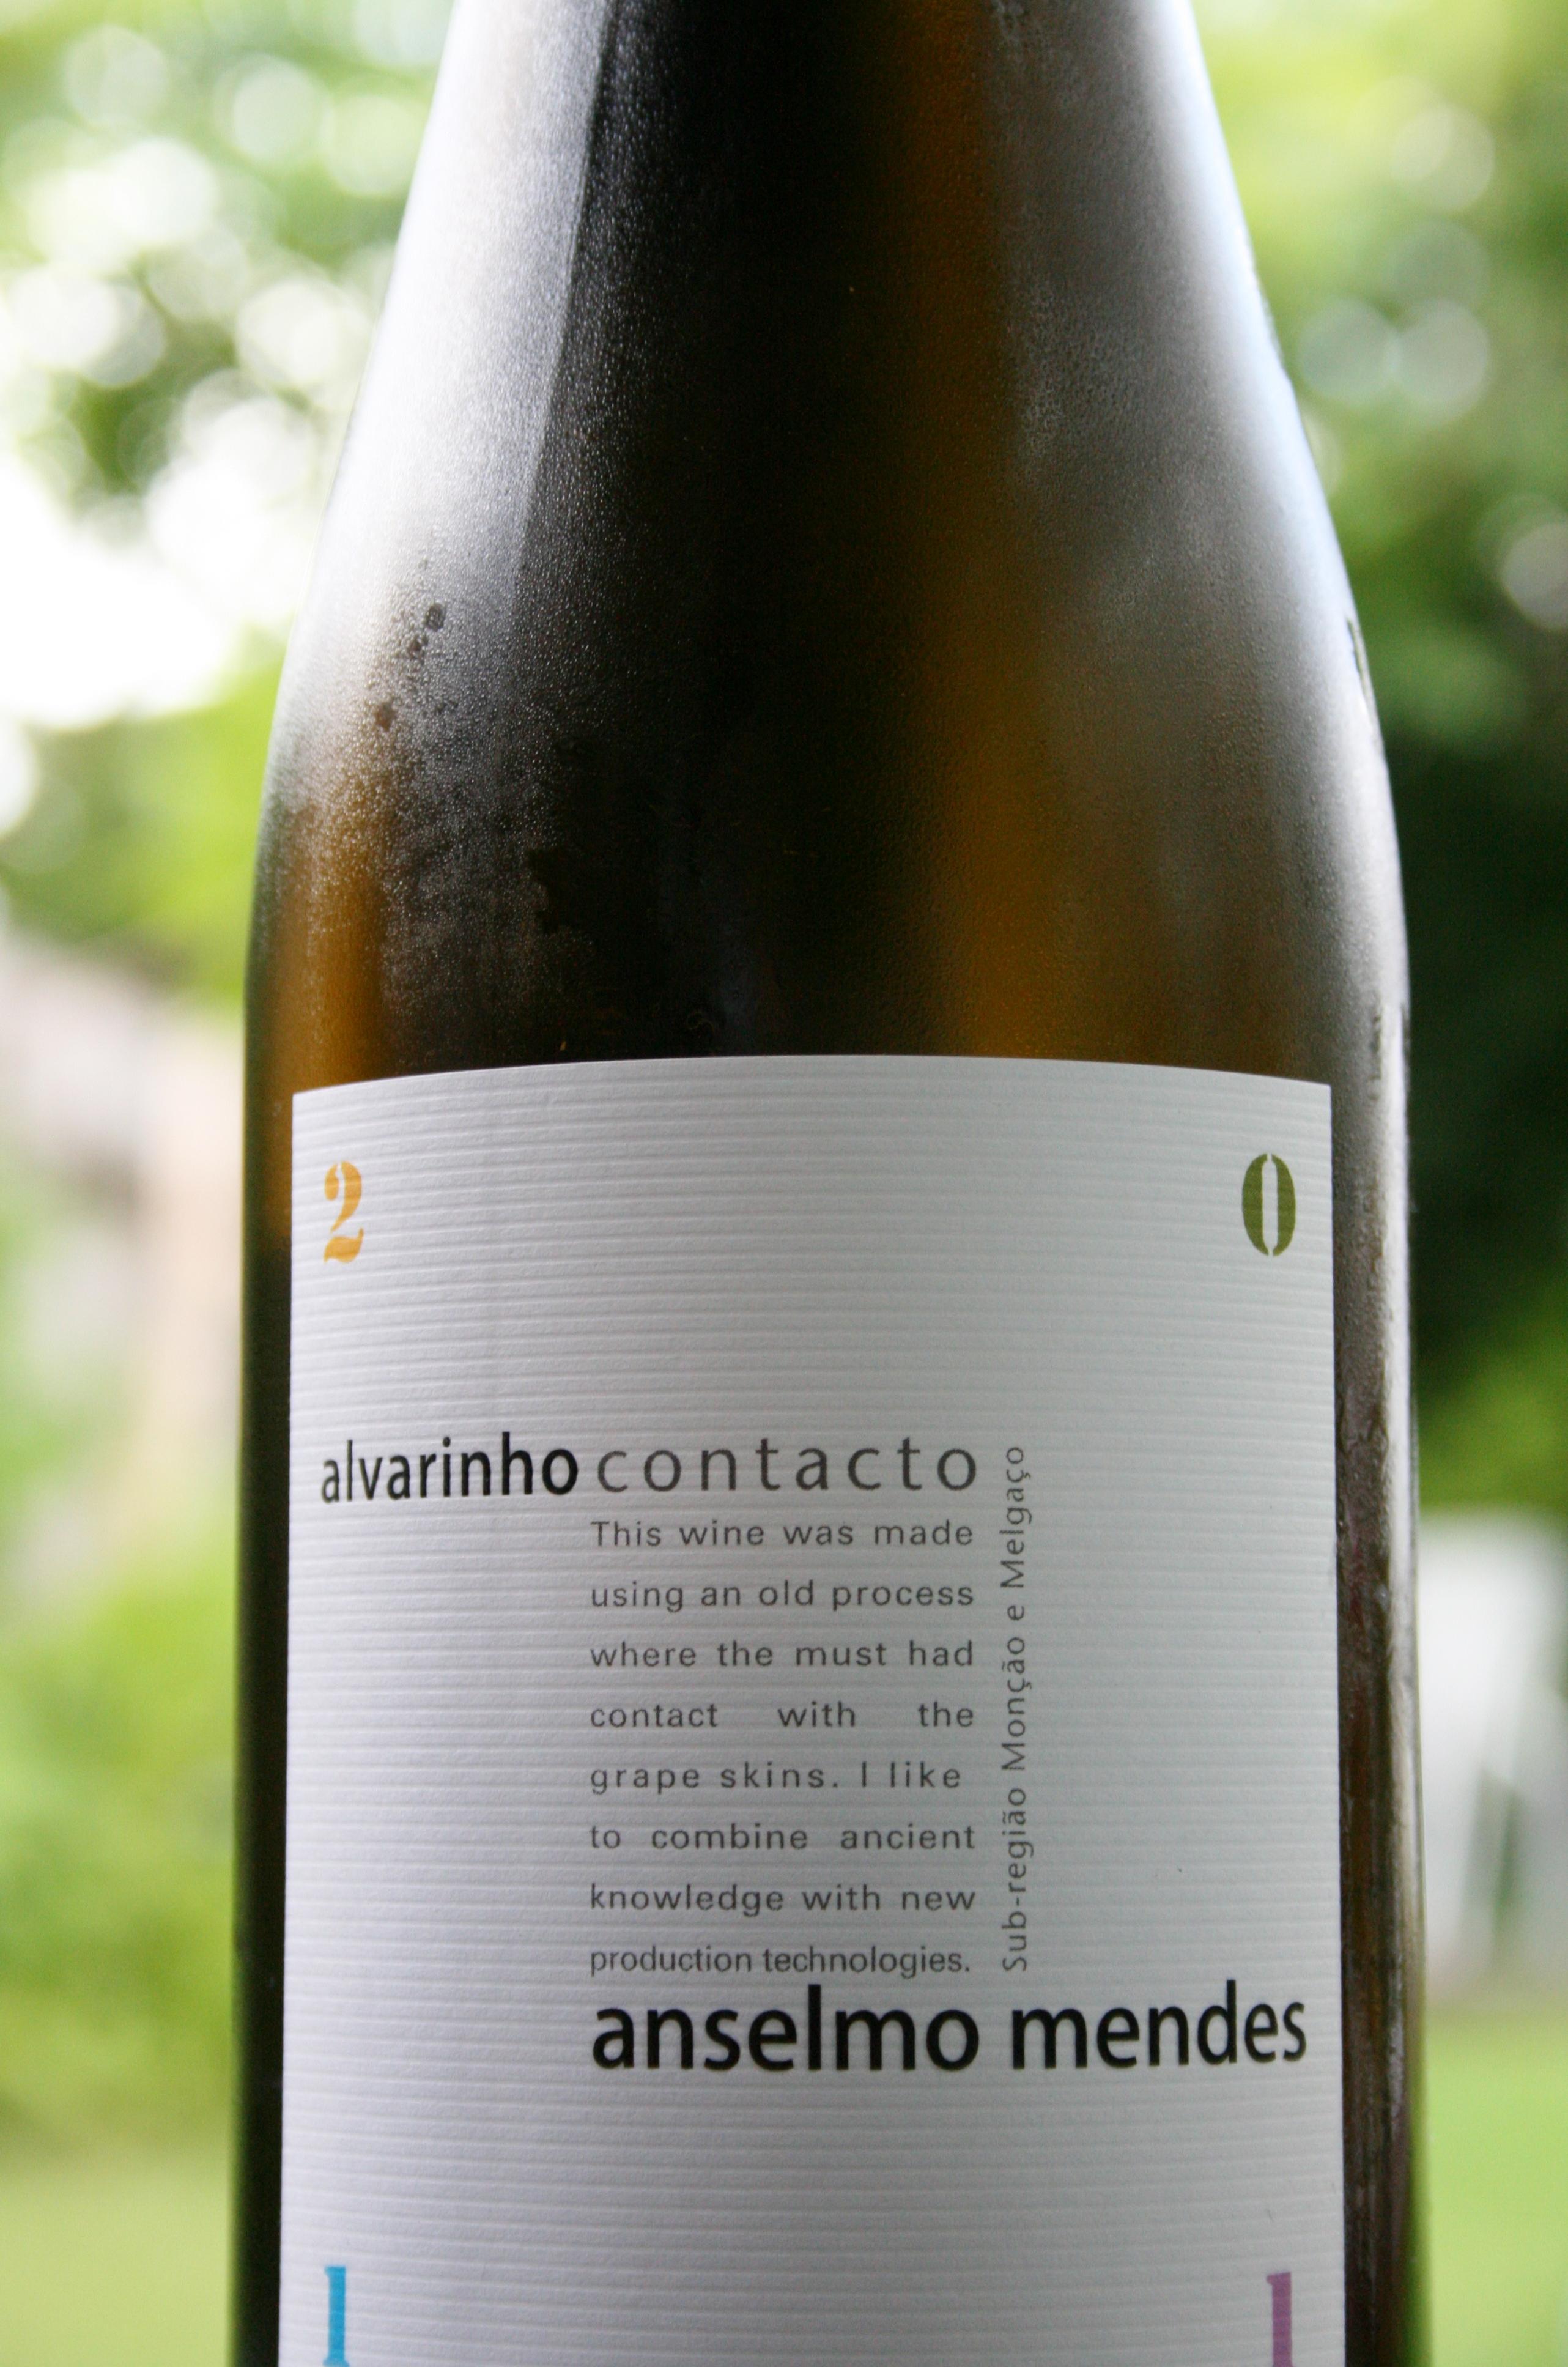 Anselmo Mendes Alvarinho Contacto